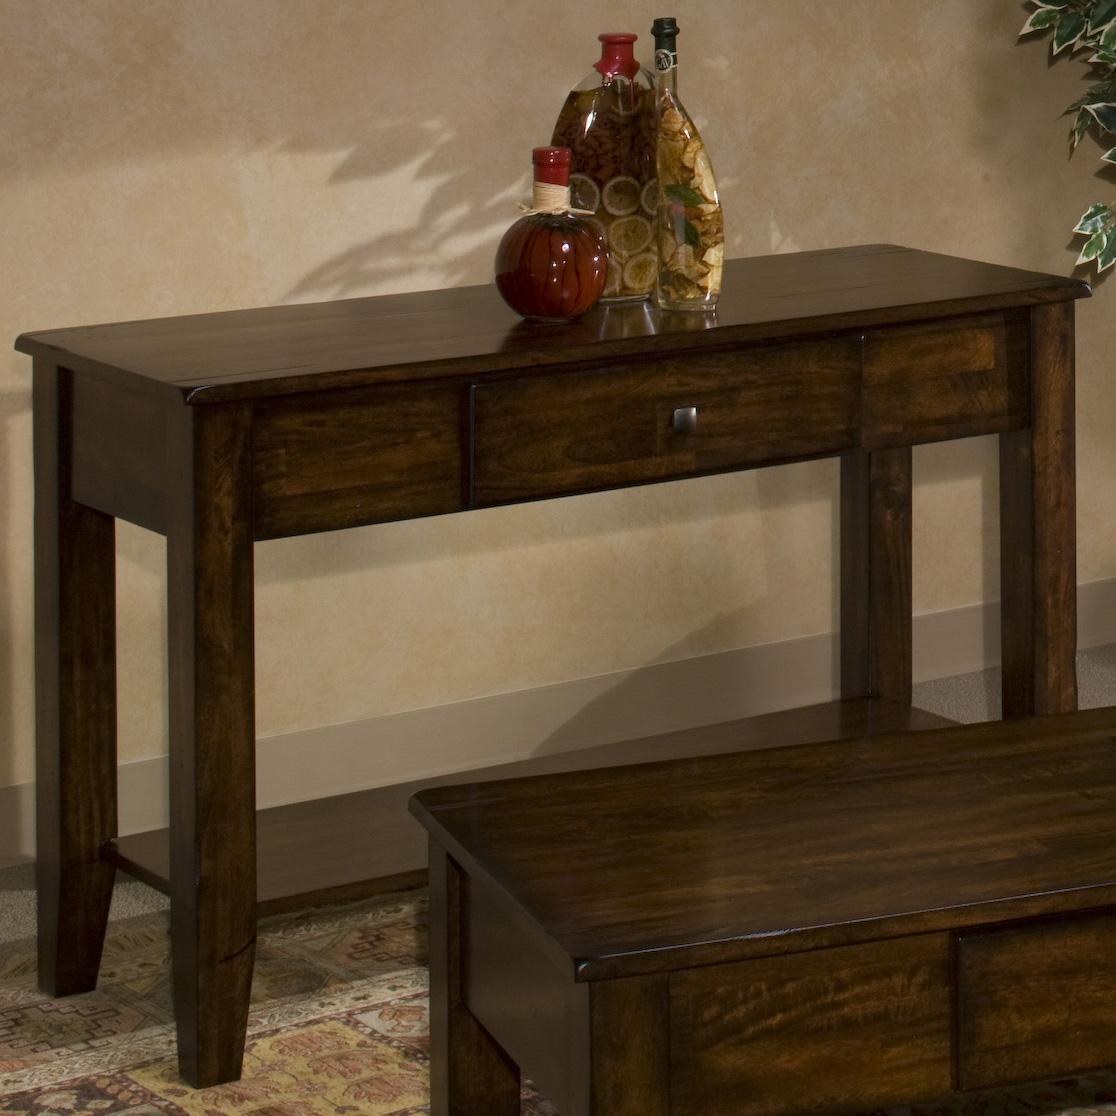 Intercon Kona Sofa Table - Item Number: KA-TA-4818S-RAI-C